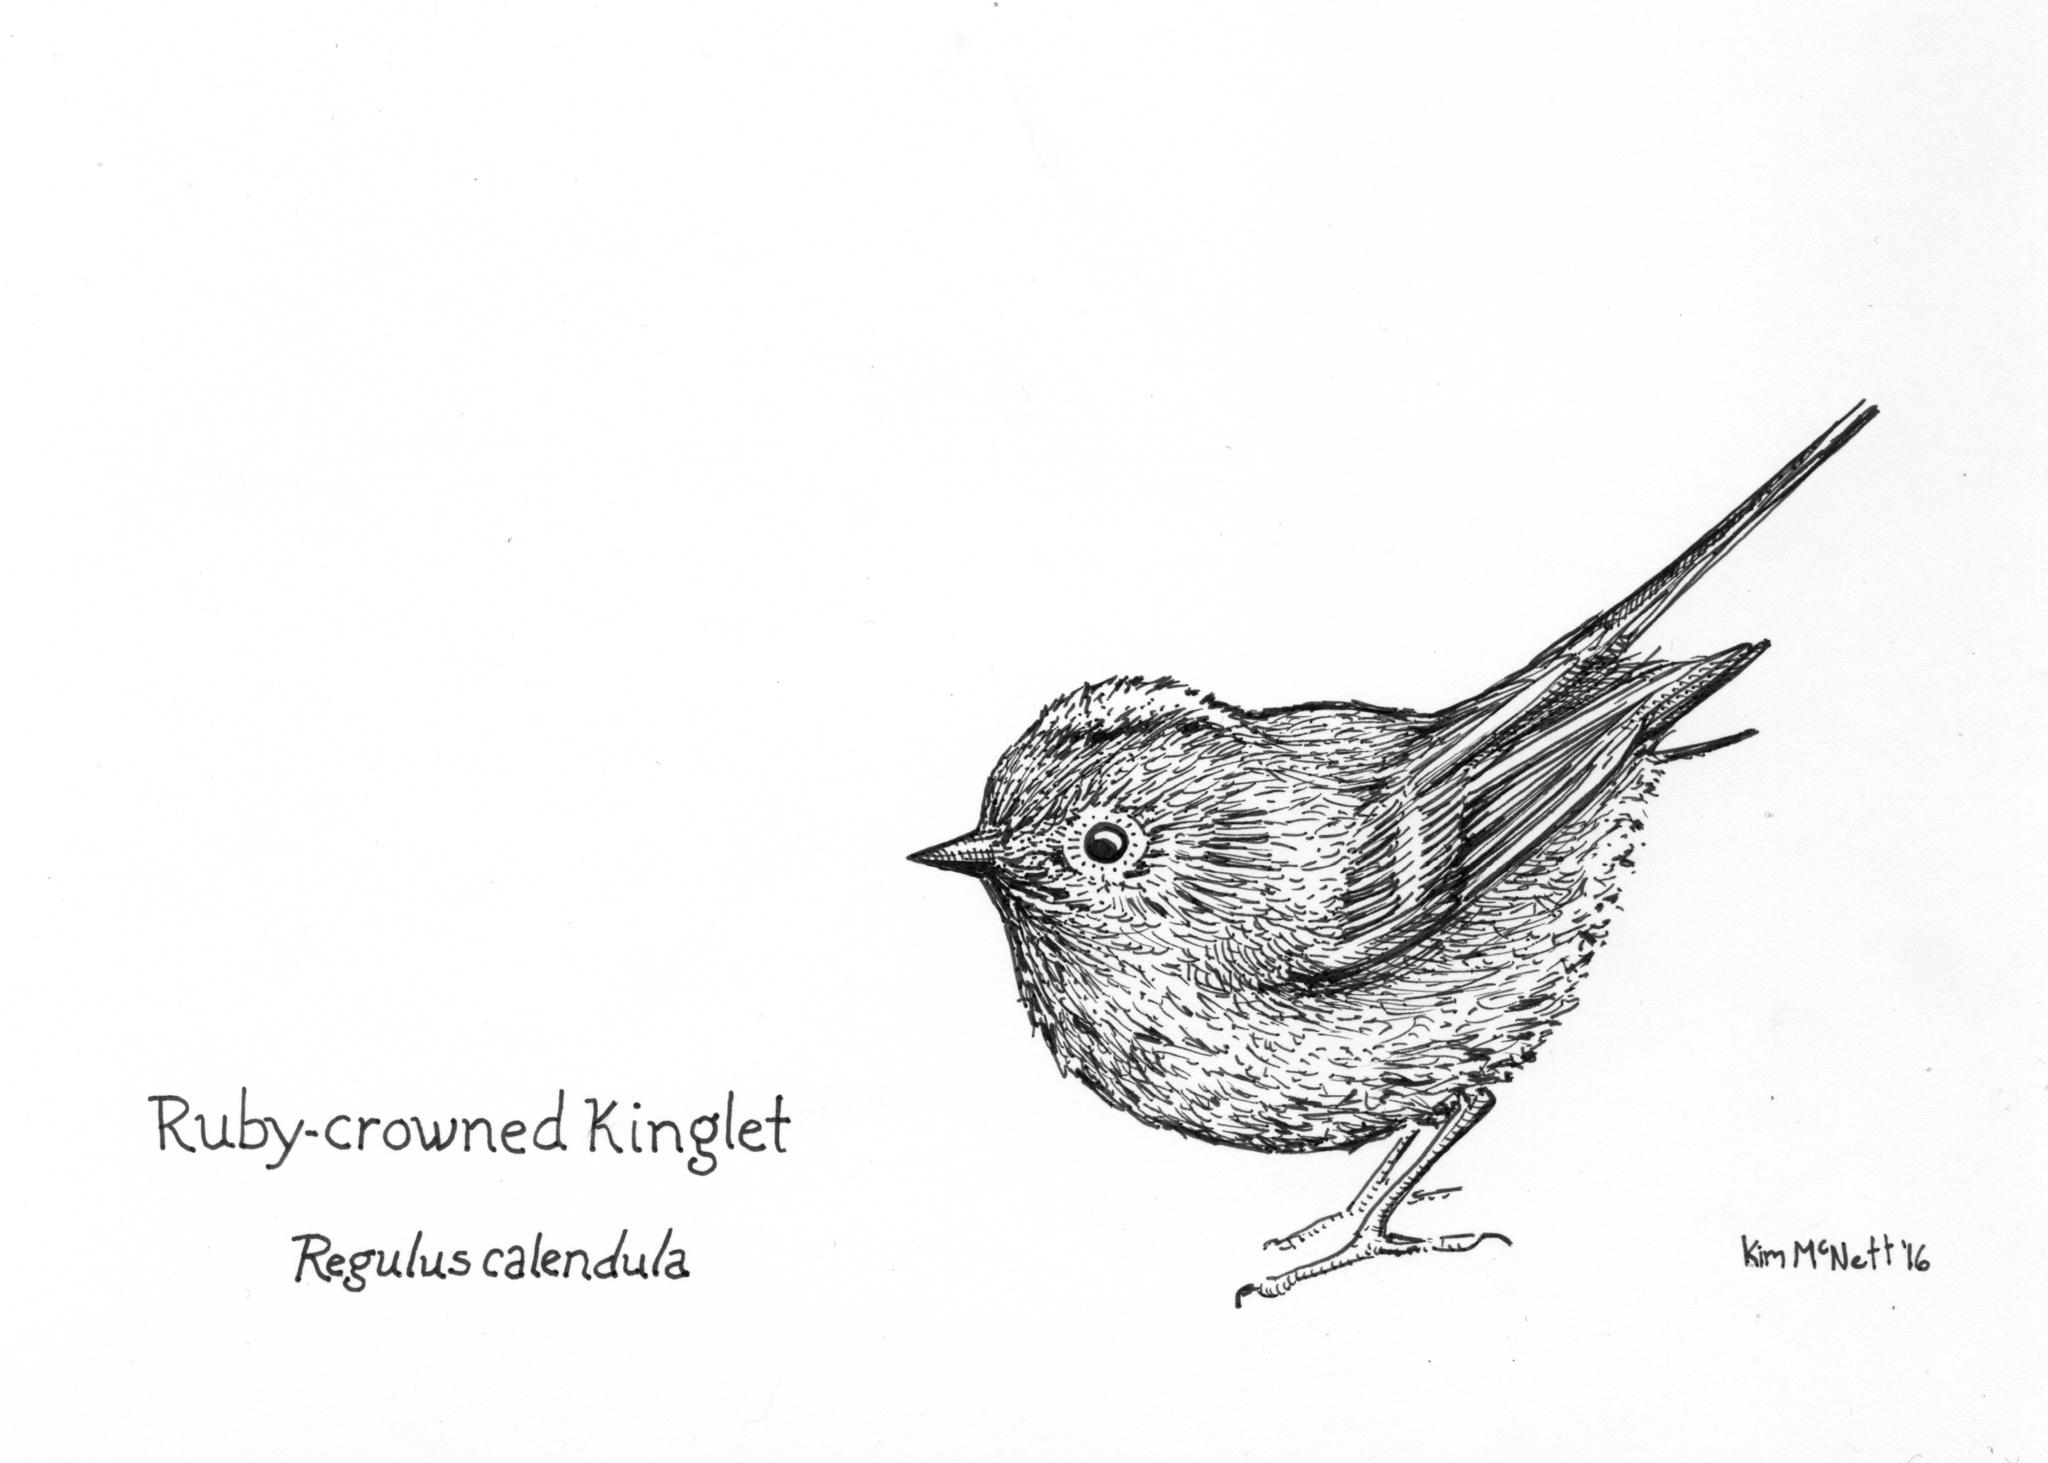 Ruby-crowned kinglet drawing, kinglet, ruby crowned kinglet